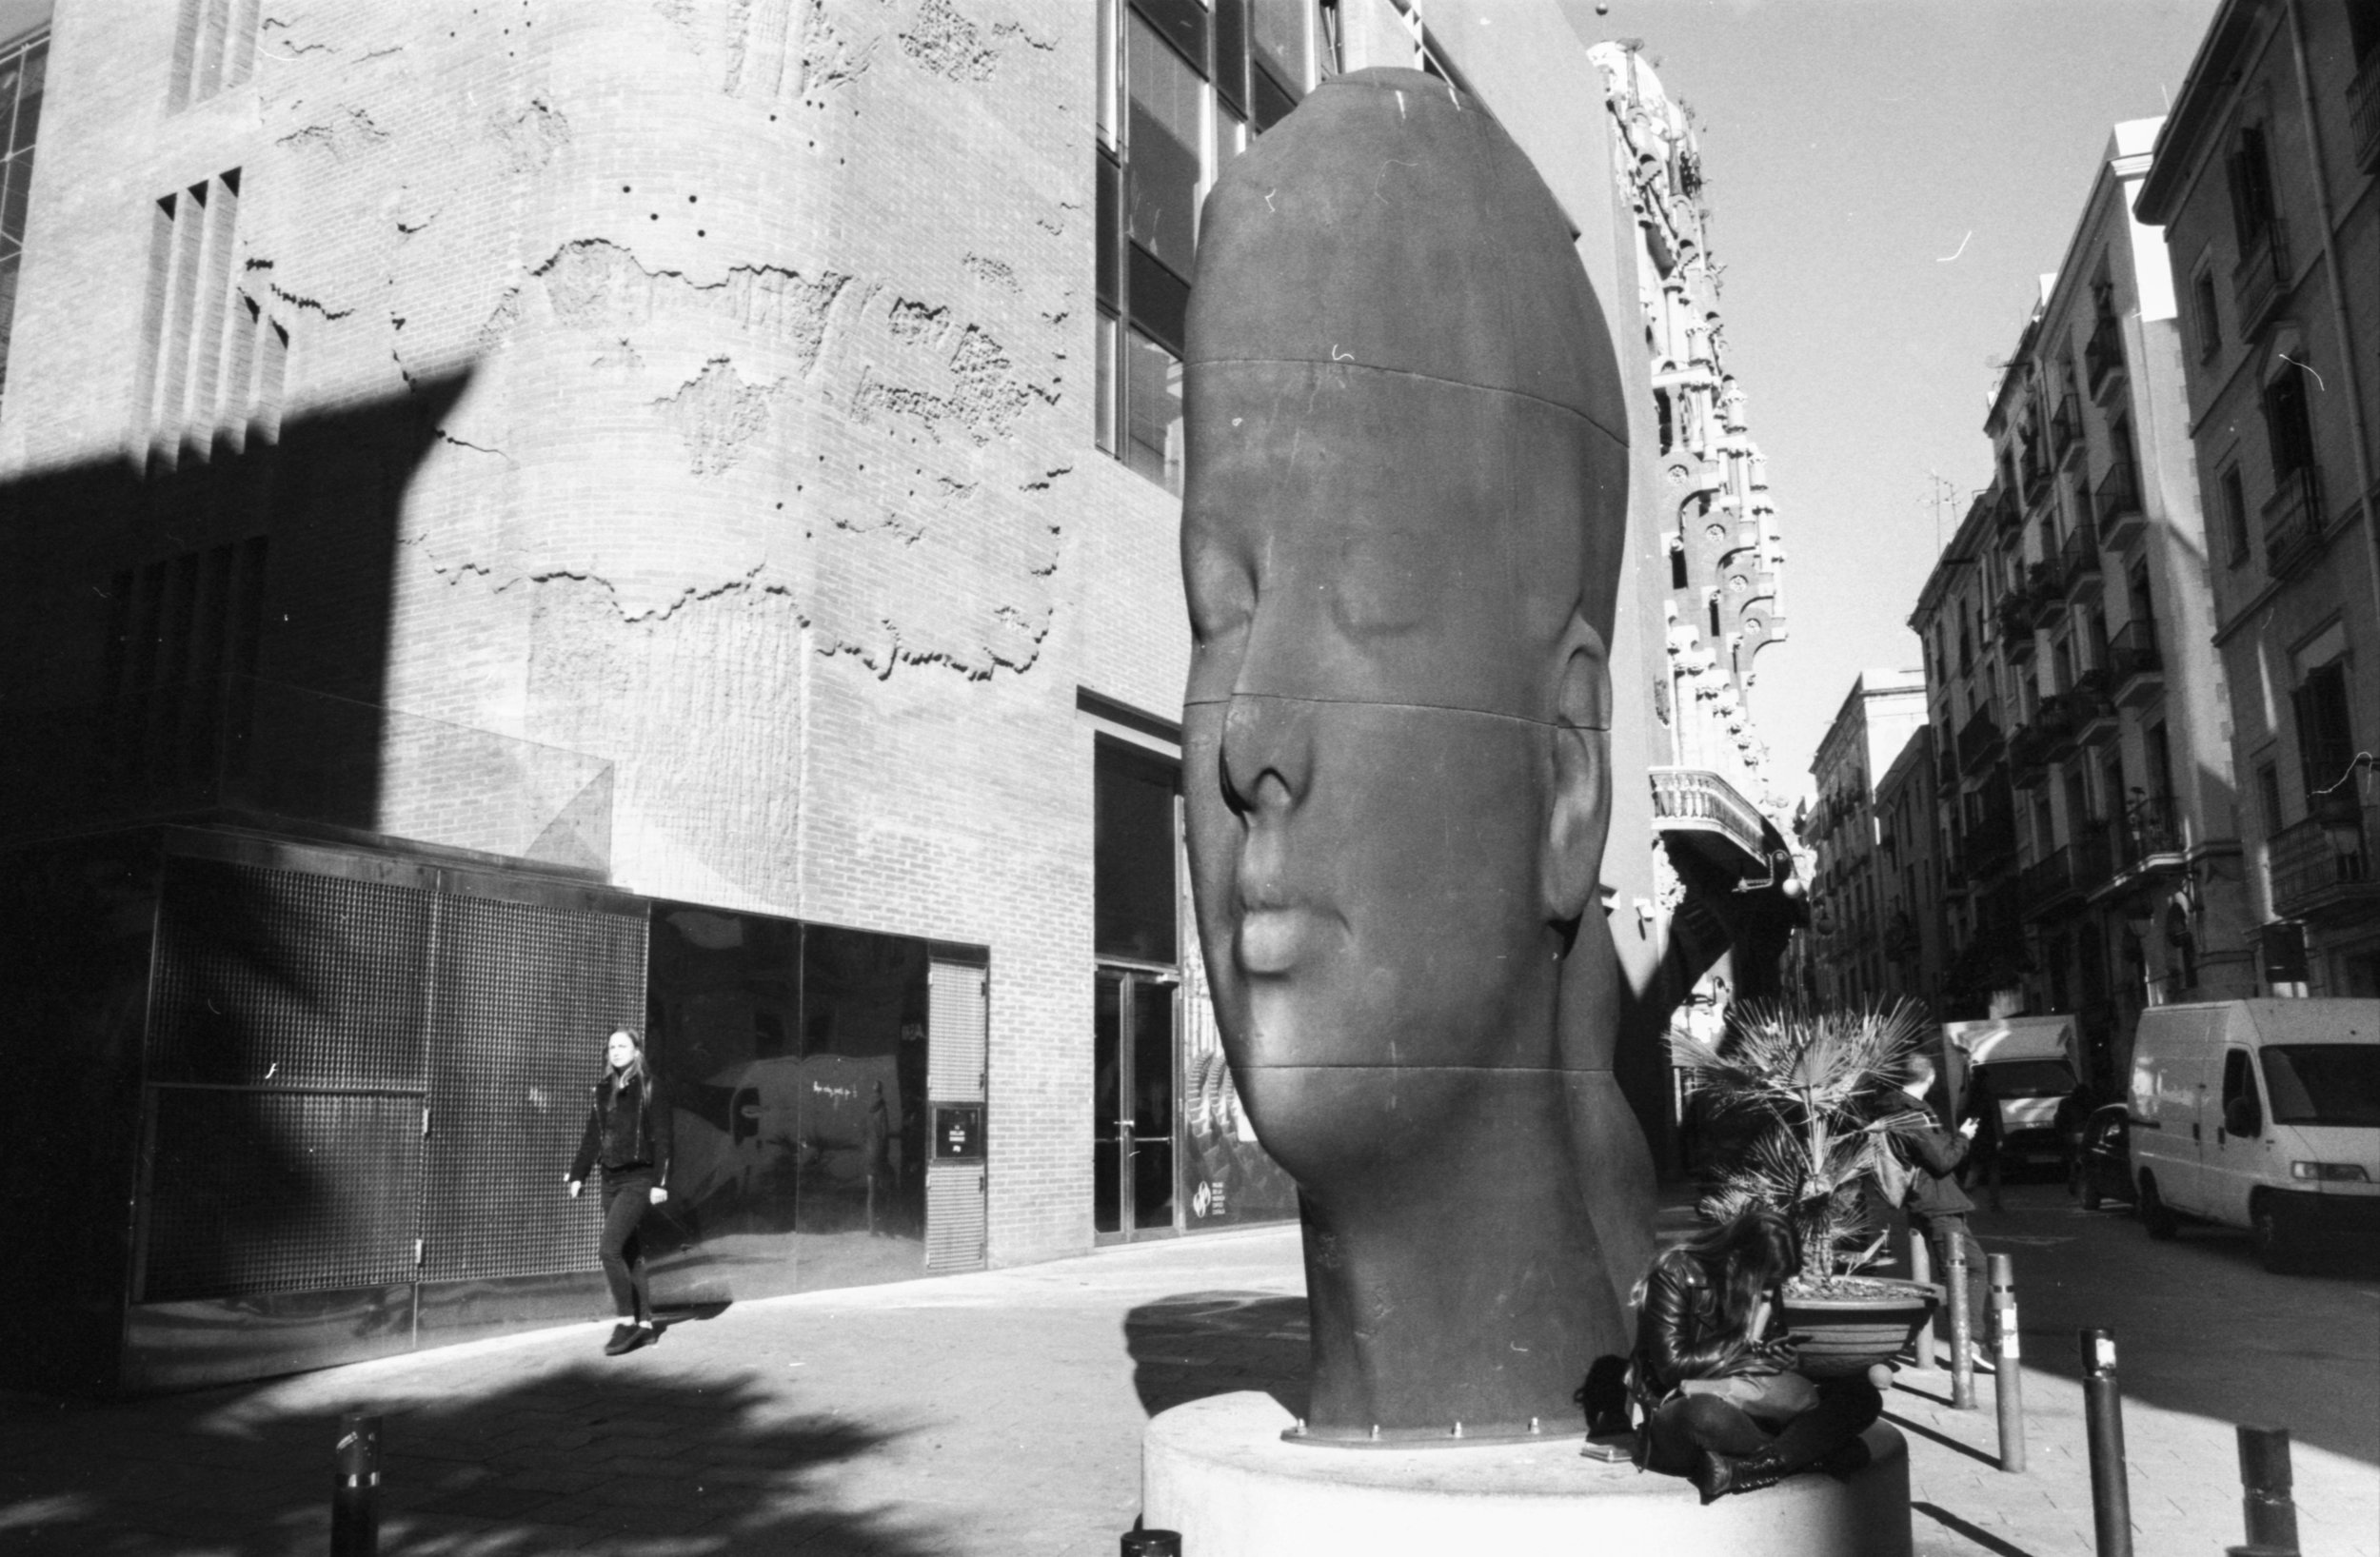 ' Carmela' iron sculpture created by Jaume Plensa